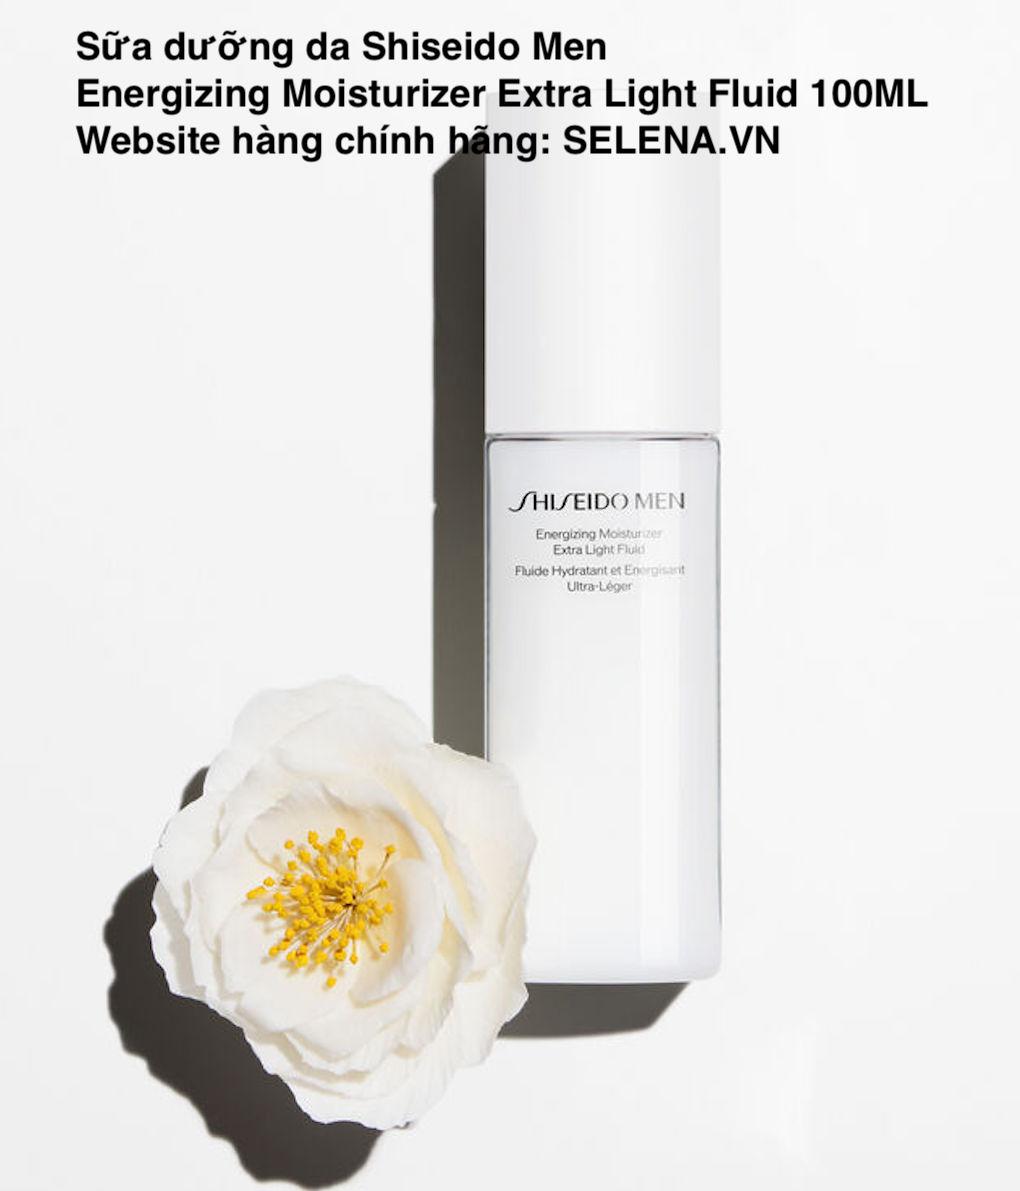 Sữa dưỡng da Shiseido Men Energizing Moisturizer Extra Light Fluid 100ML